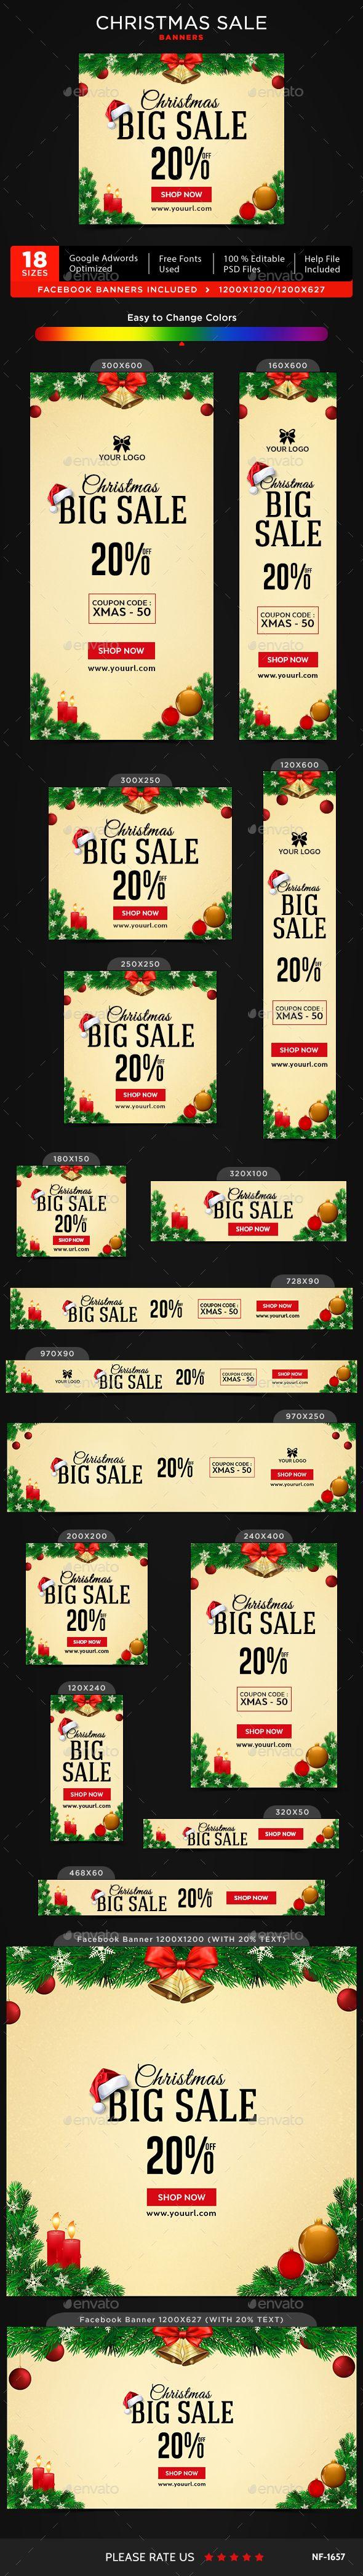 Christmas Banners Template PSD #xmas #ads